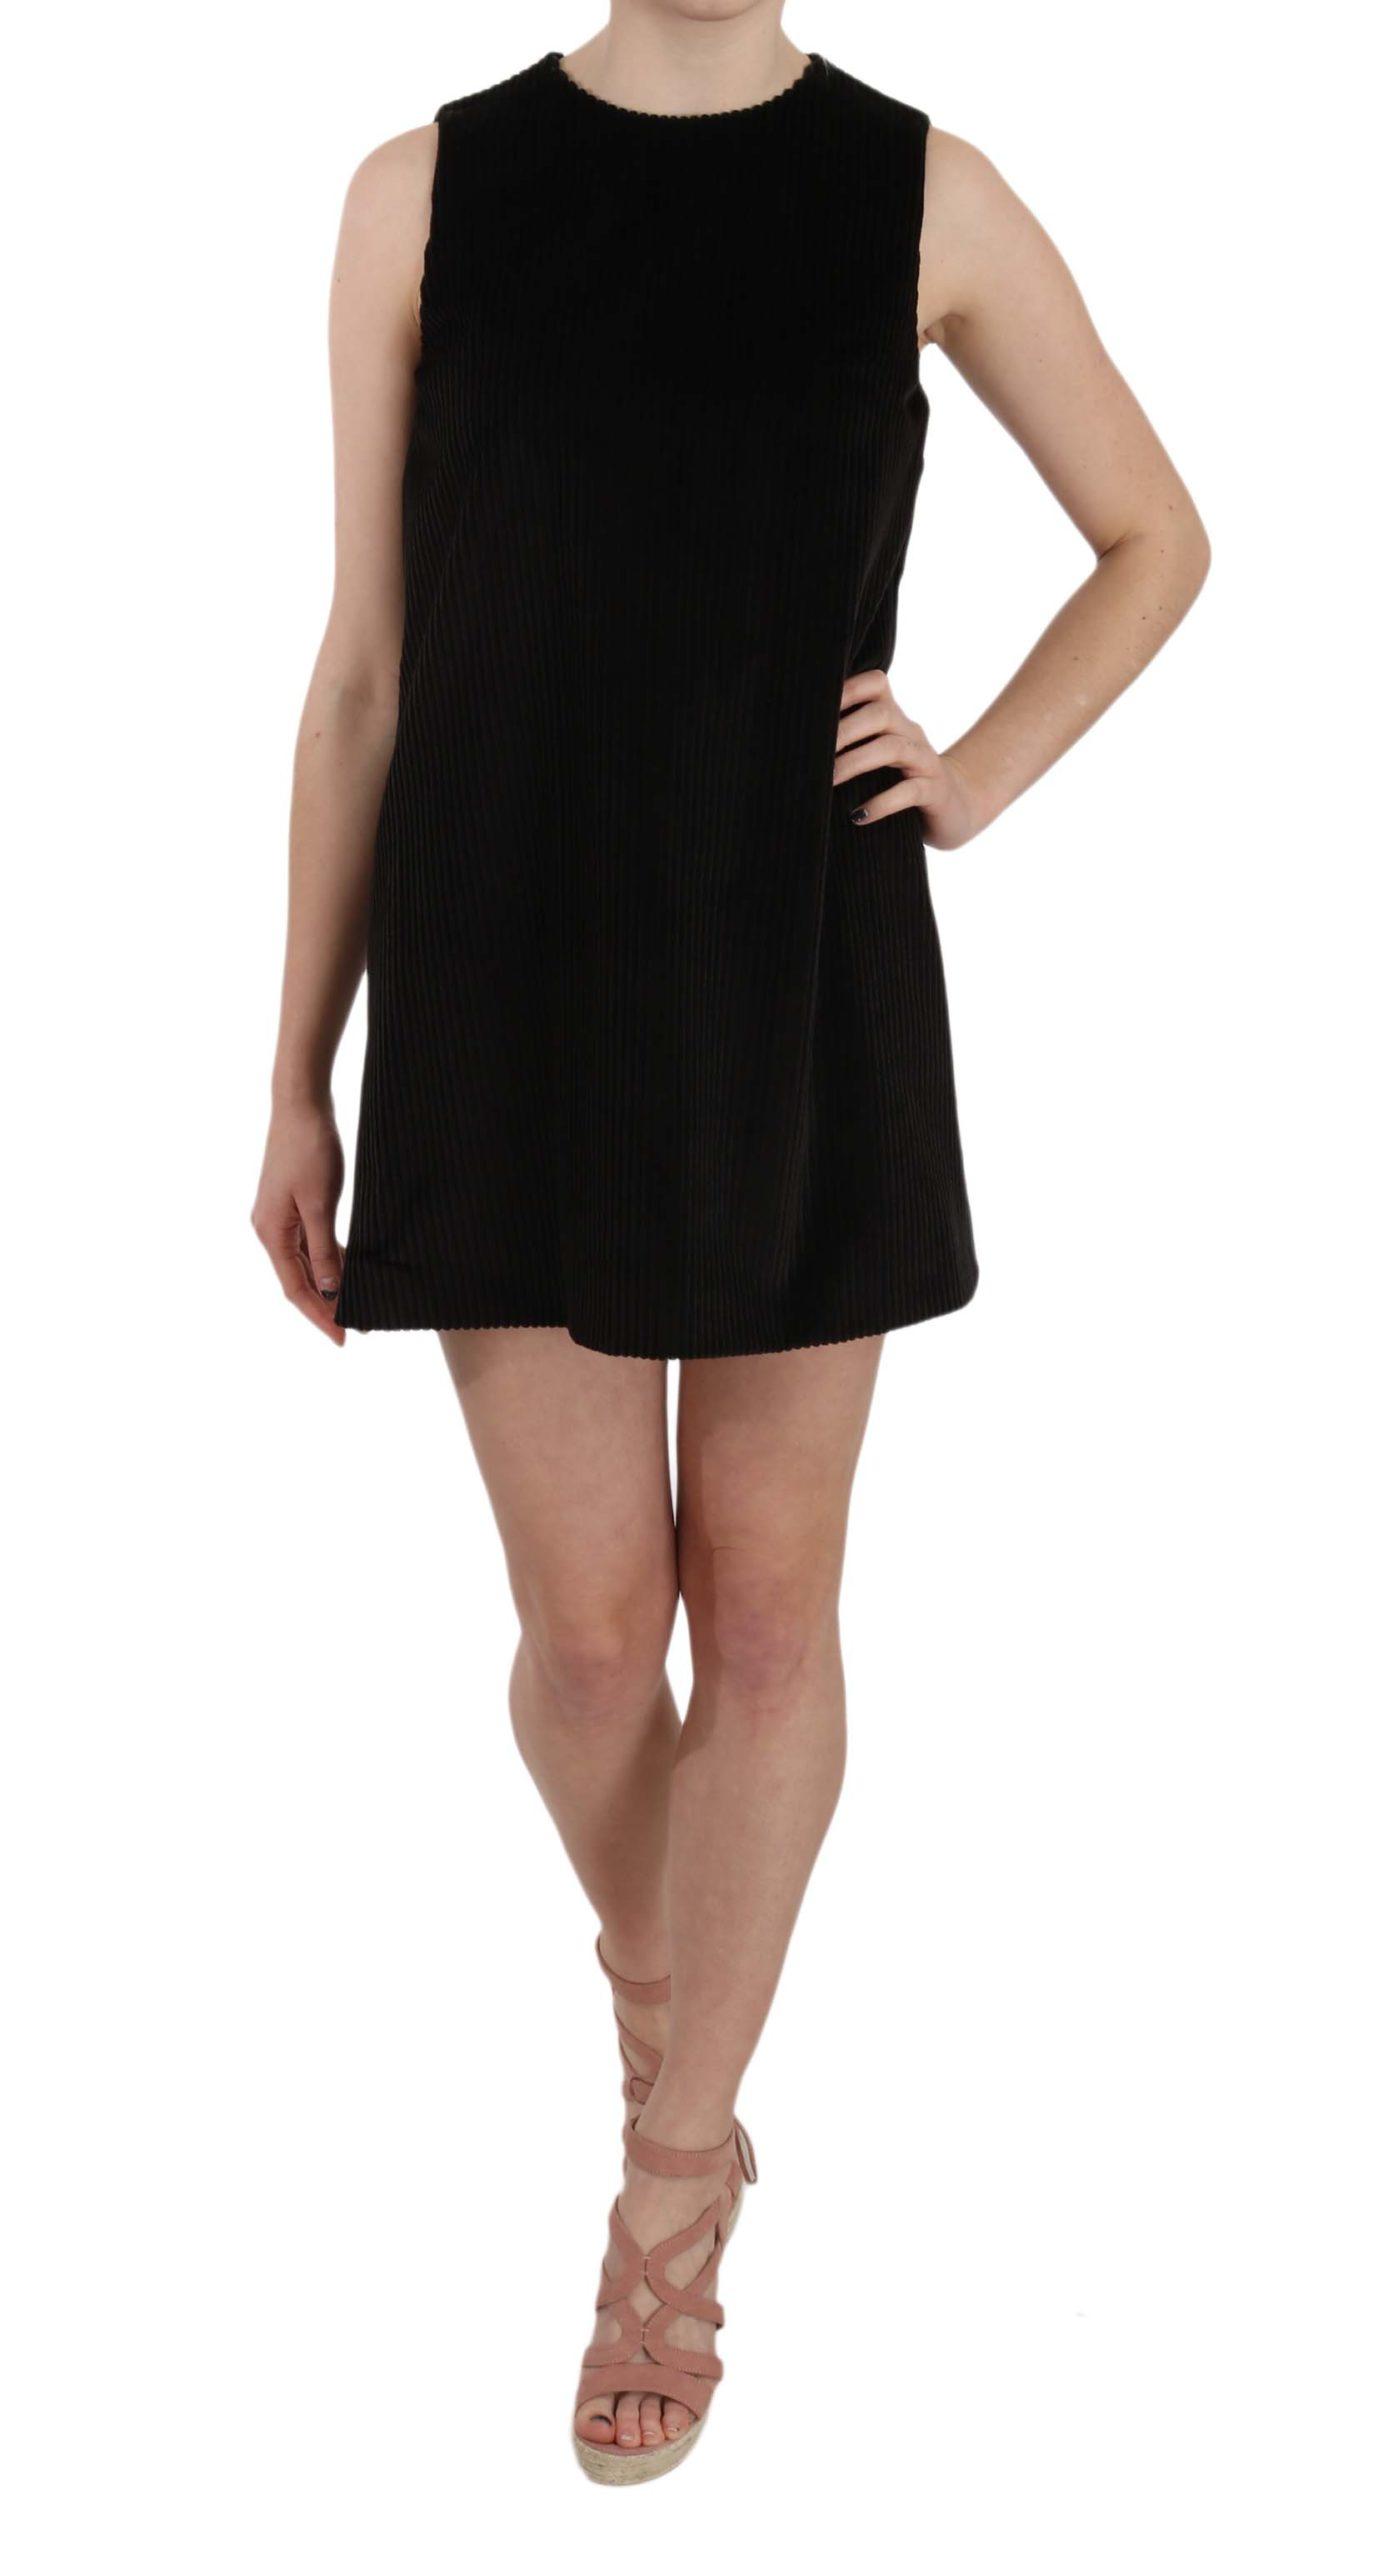 Dolce & Gabbana Women's Cotton Sleeveless Shift Mini Dress Black TSH3256 - IT40|S